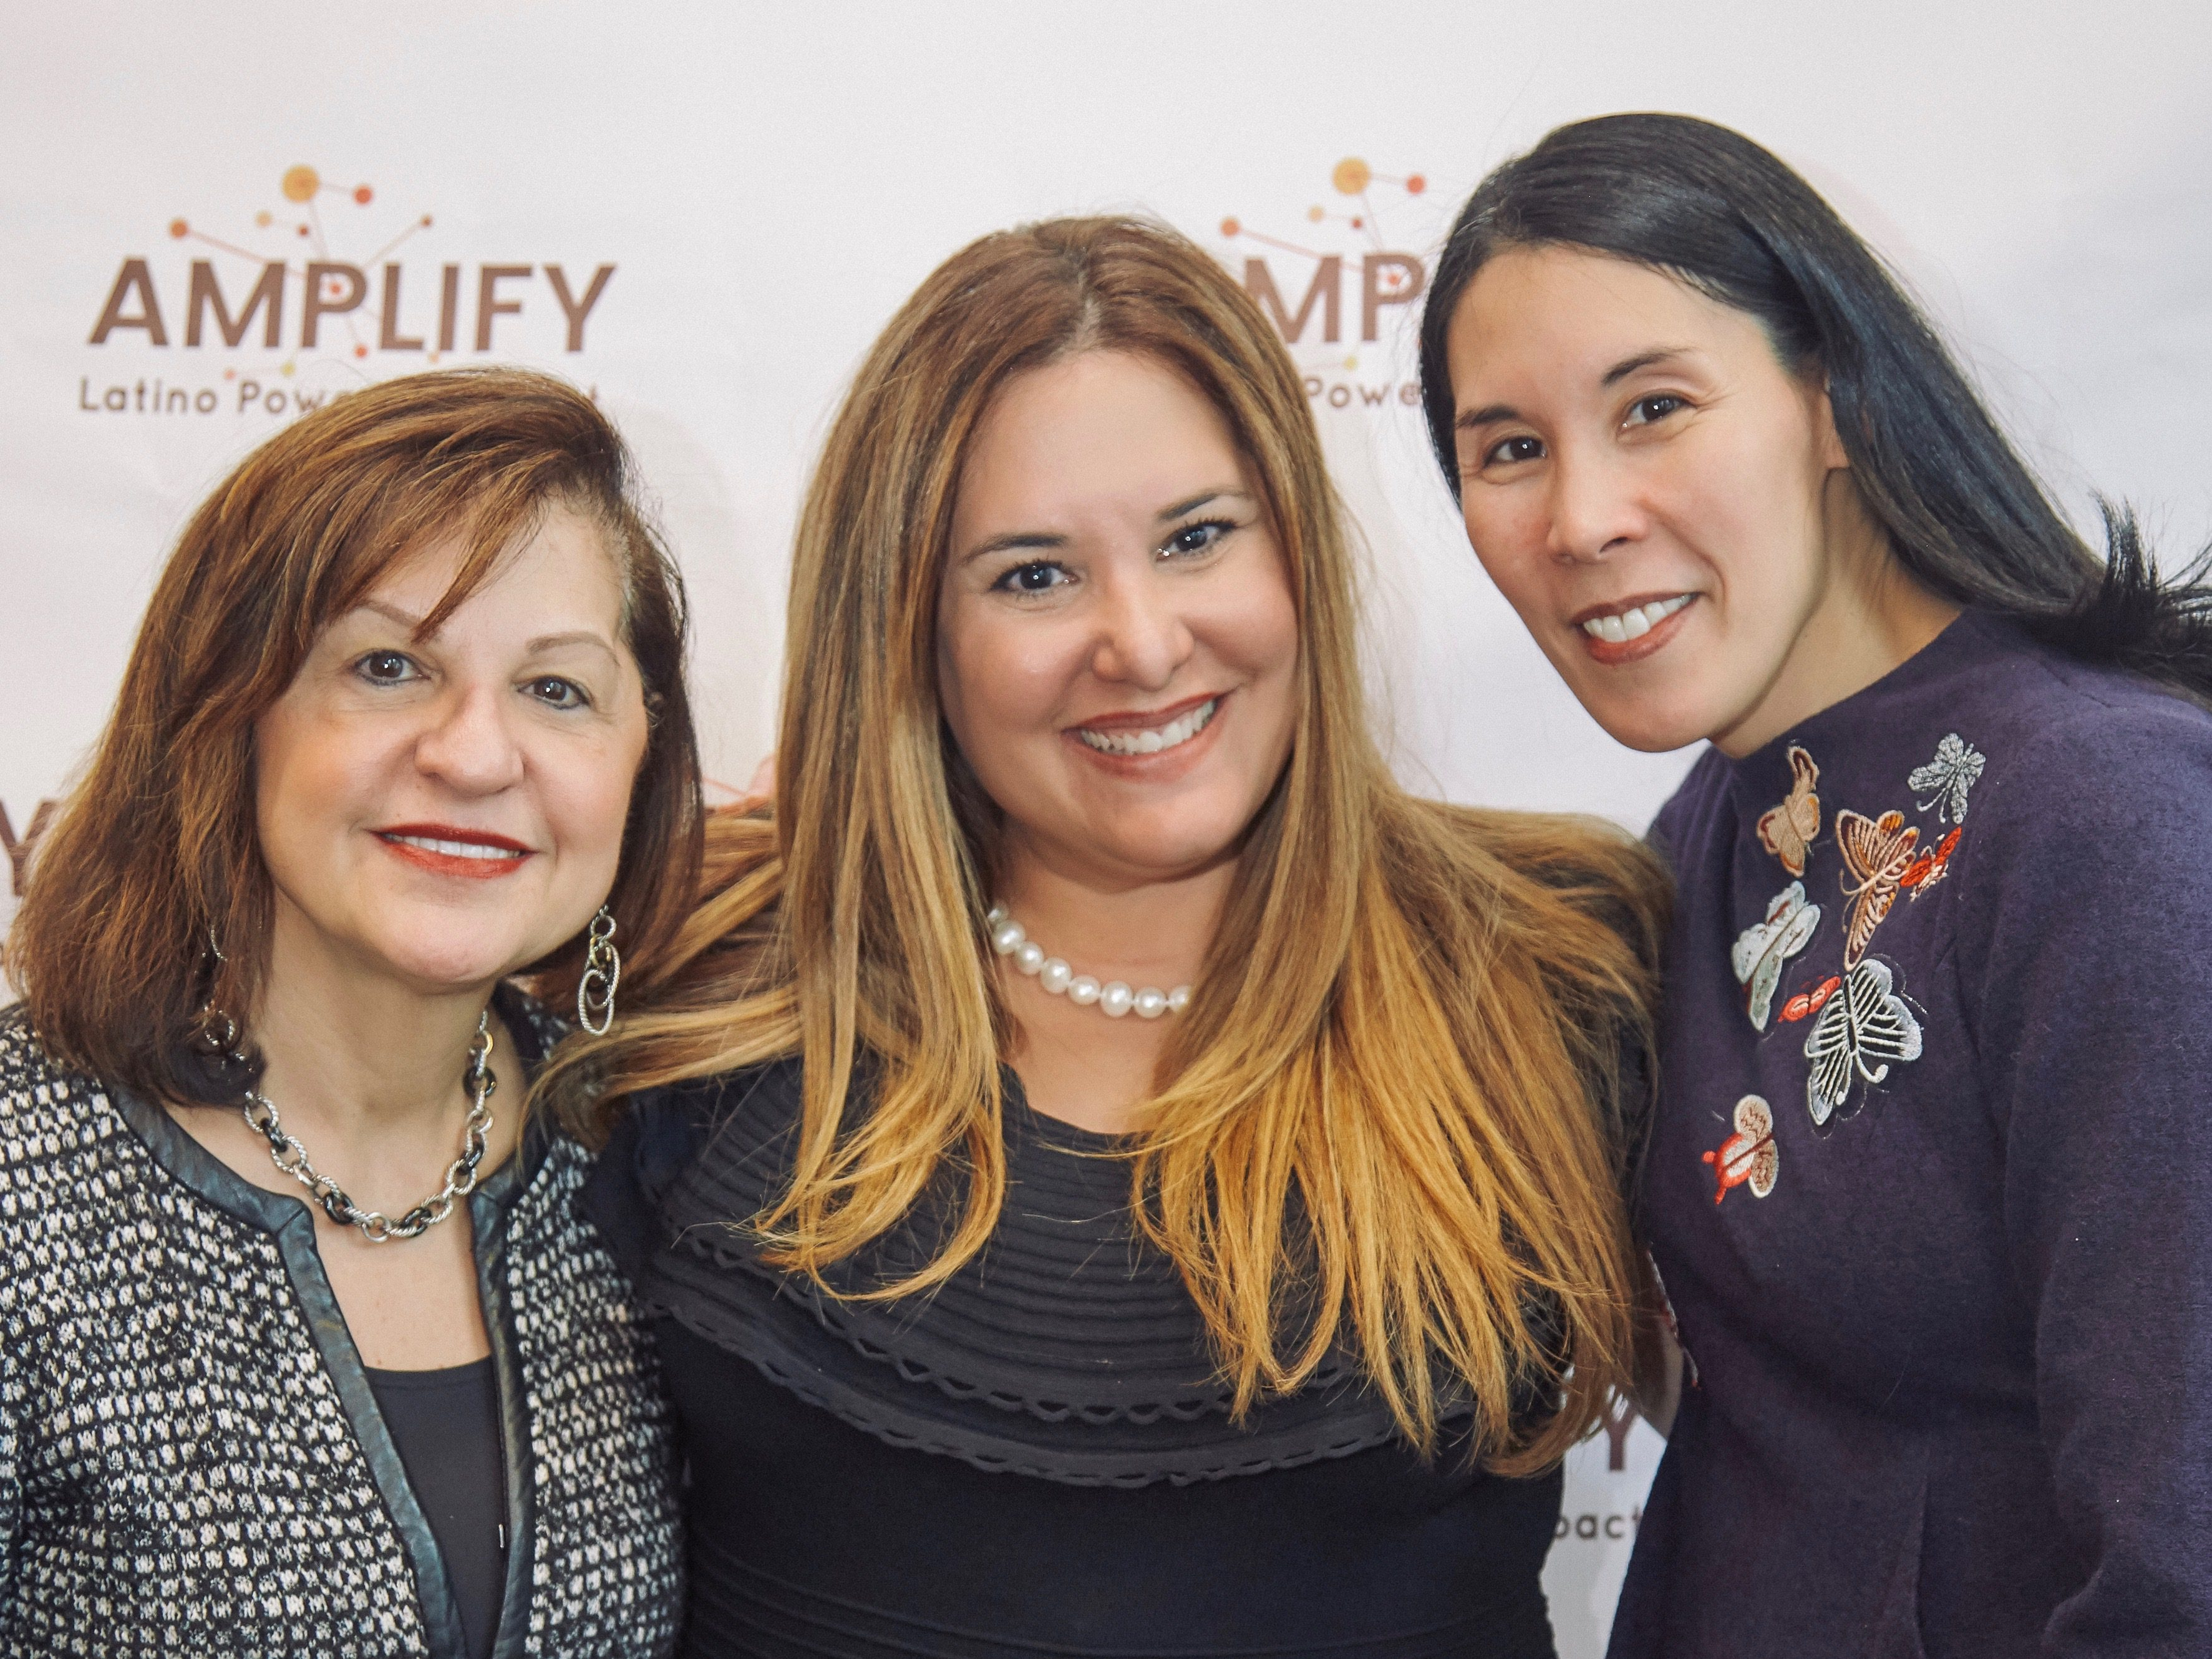 Amplify-Eneida Betty Carmen